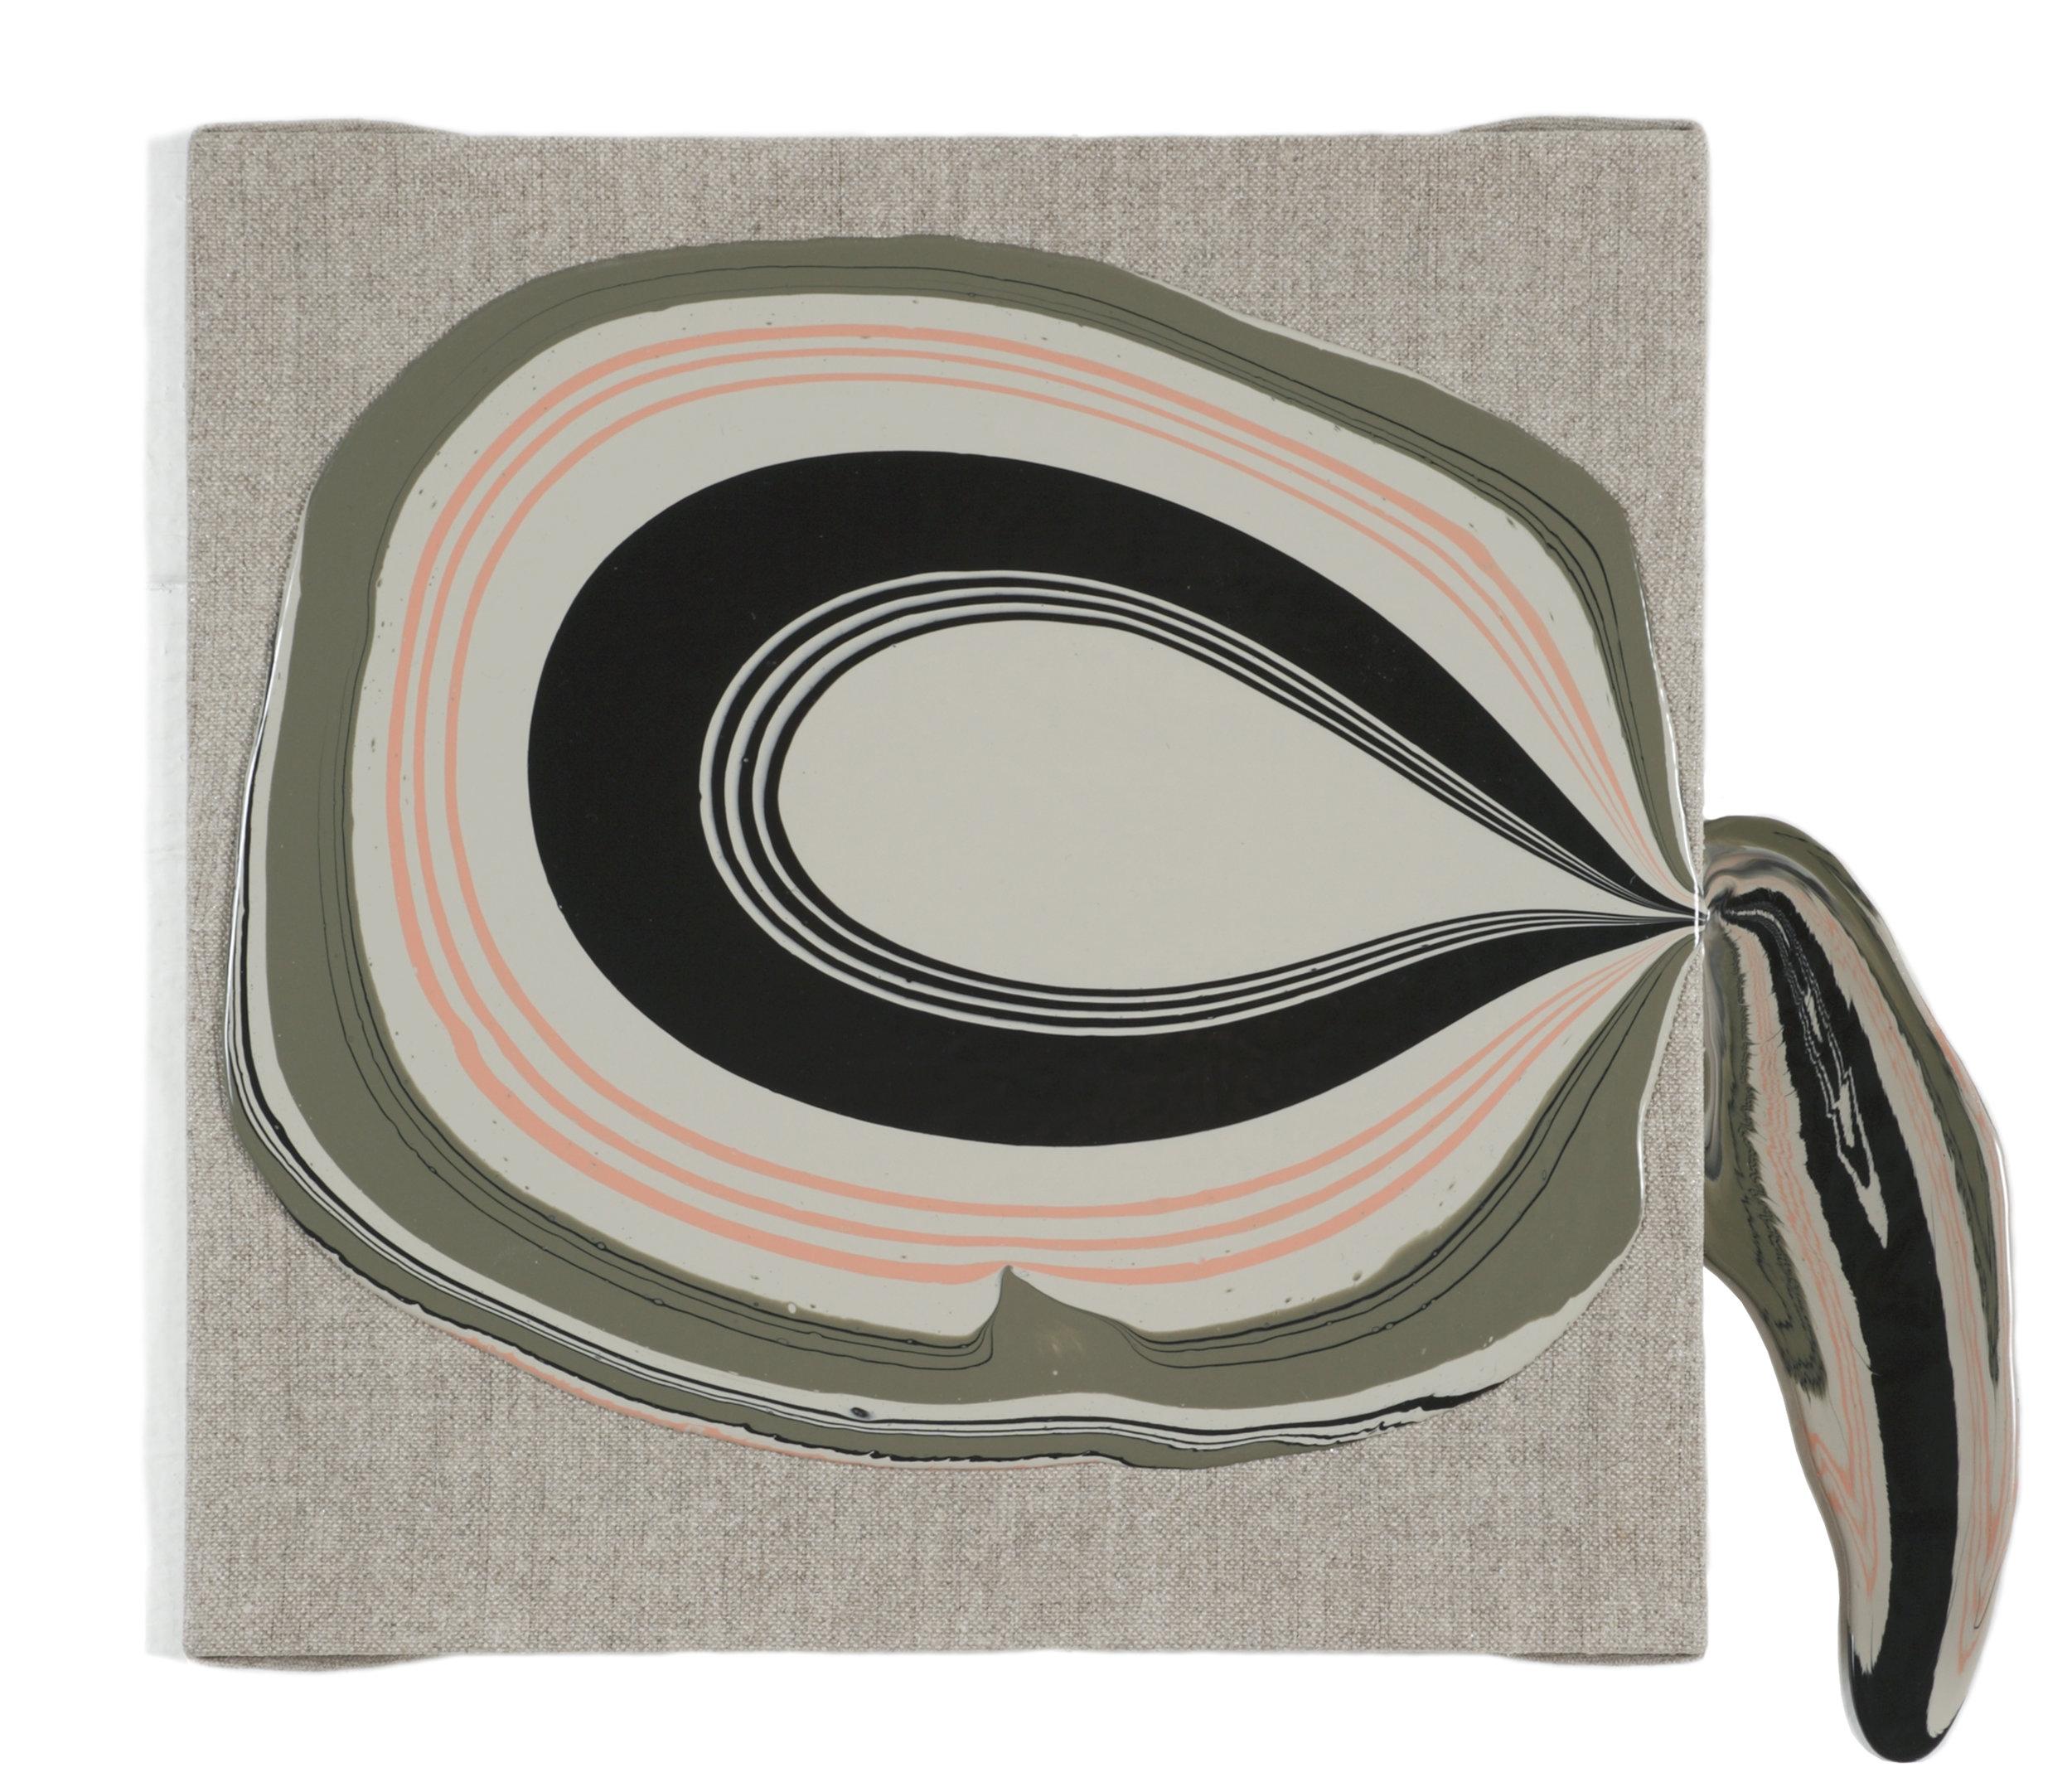 """Amerika"" (inspired by Edward Gorey Book Cover Design,) acrylic medium on linen, 11 x 13 x 3"", $475"